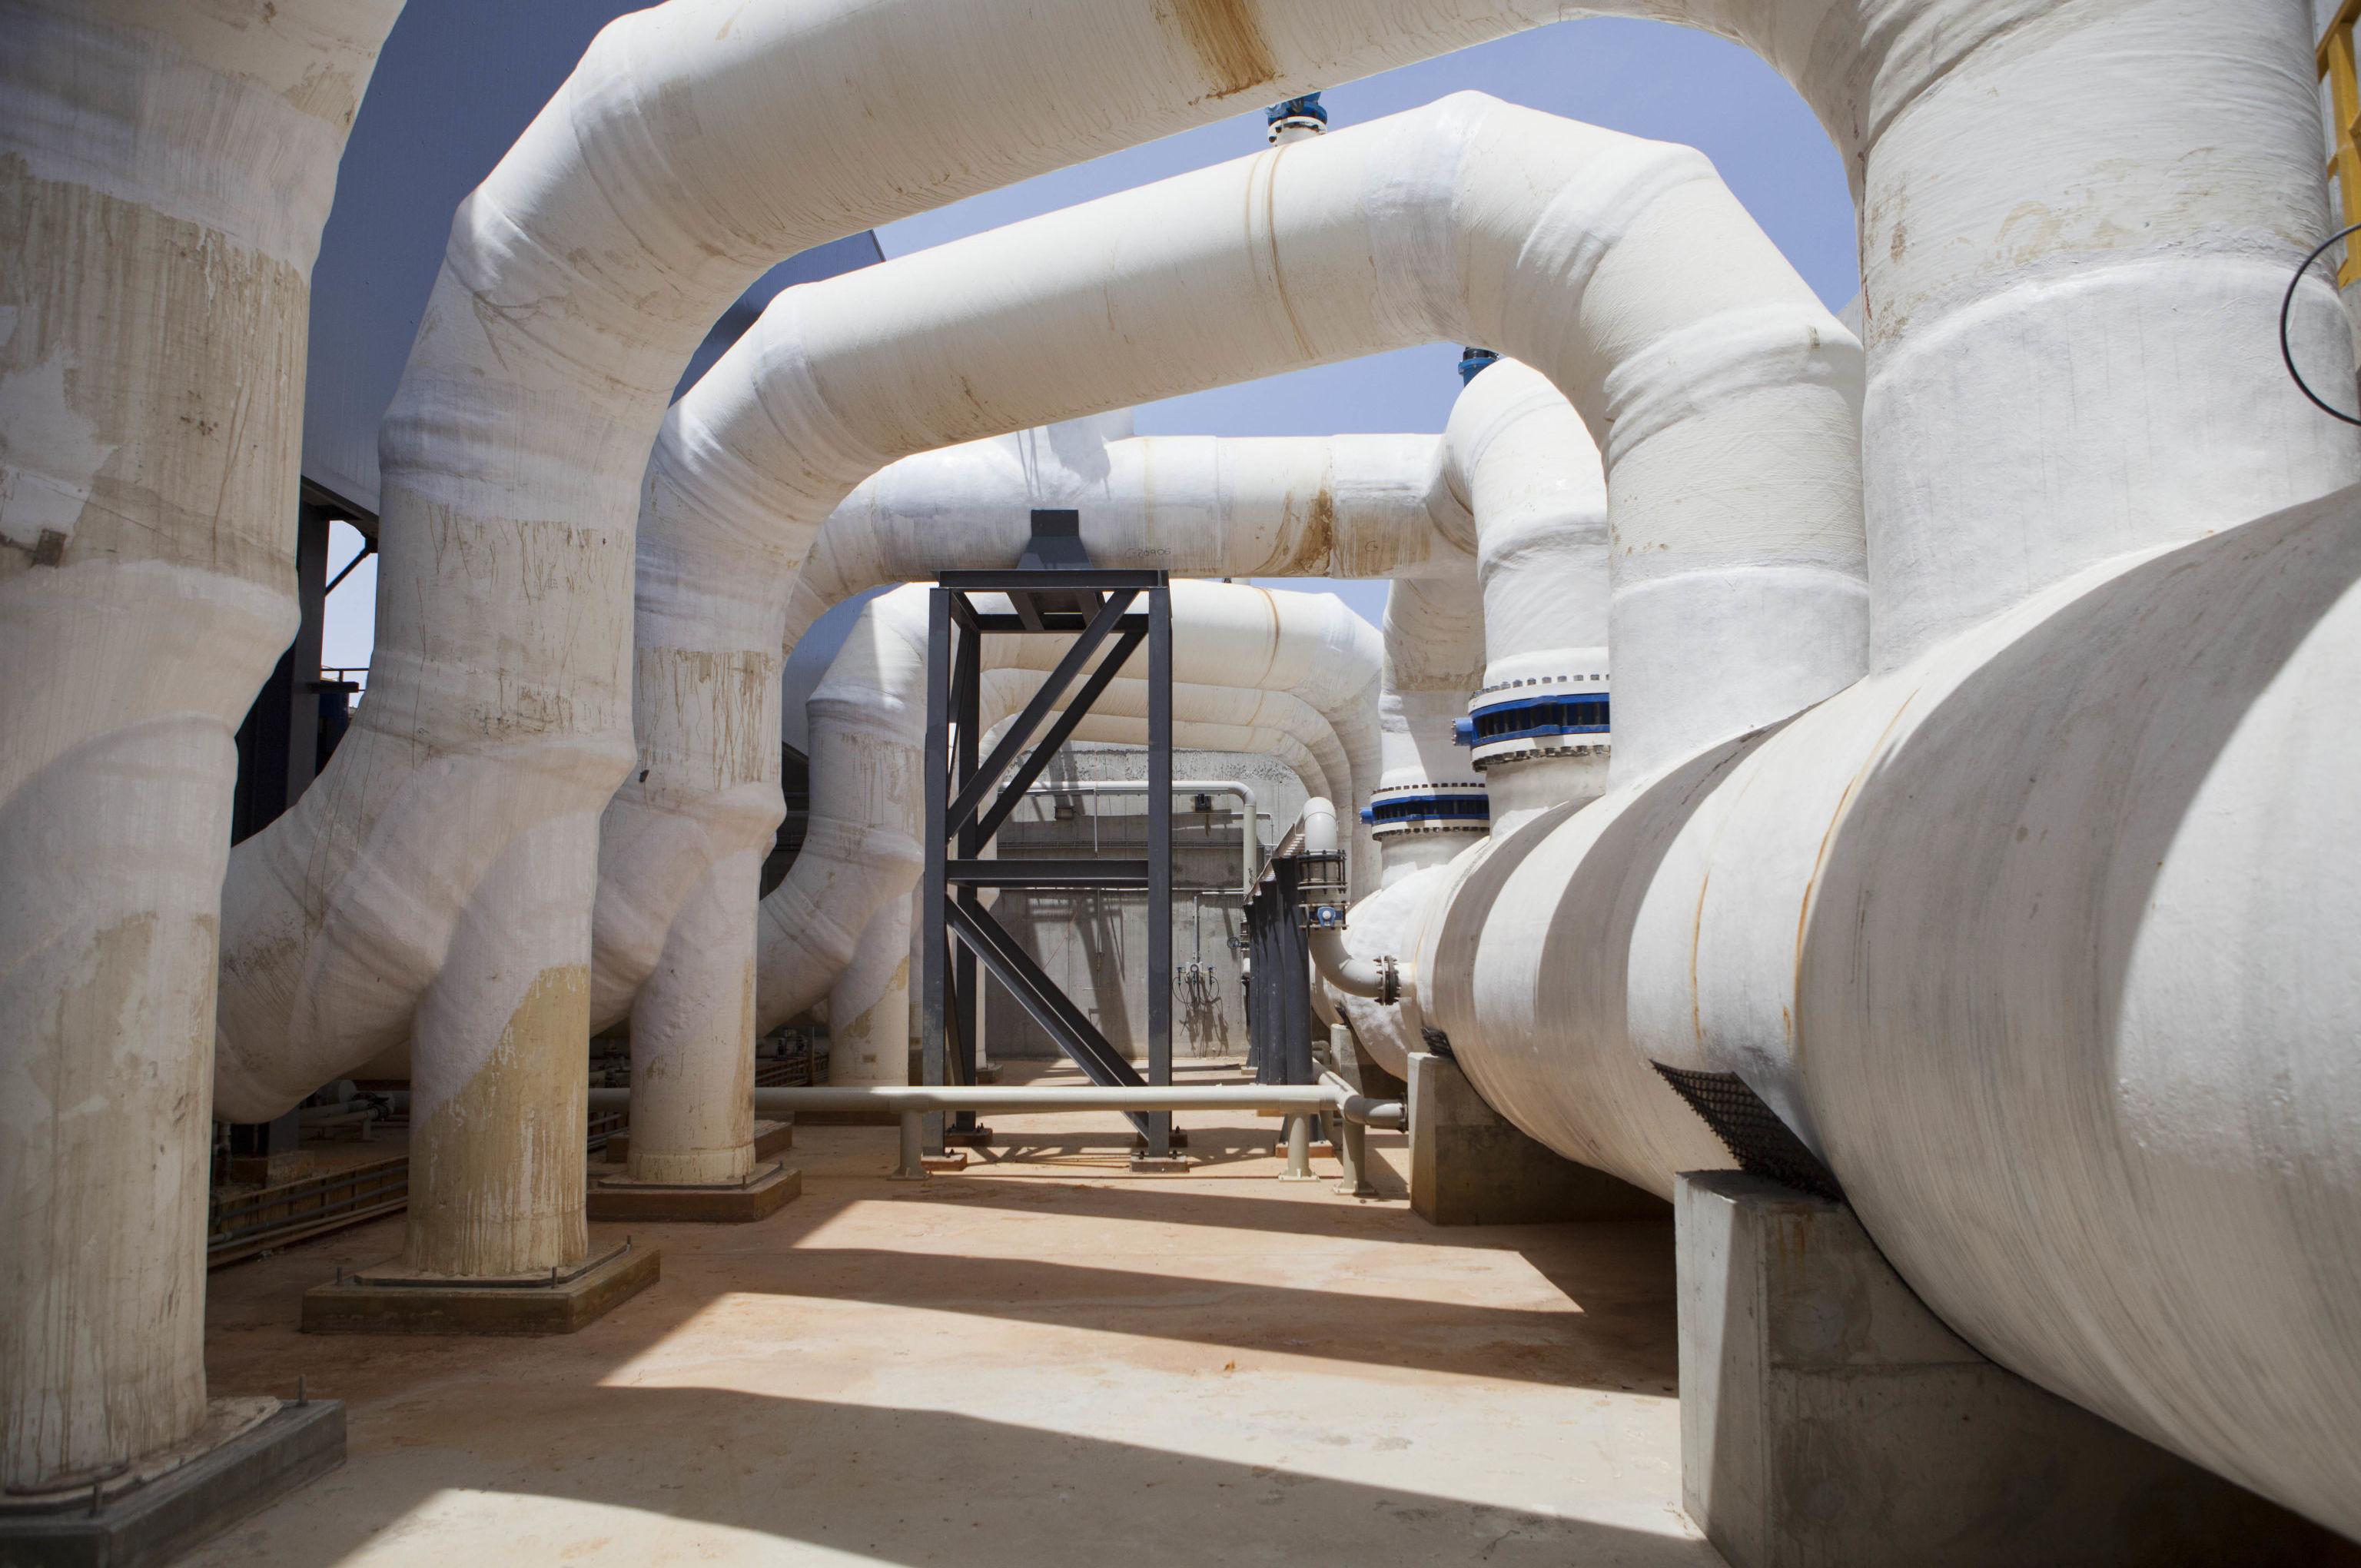 Usina dessalinizadora em Rishon Letzion, Israel, foto de 4 de maio de 2004